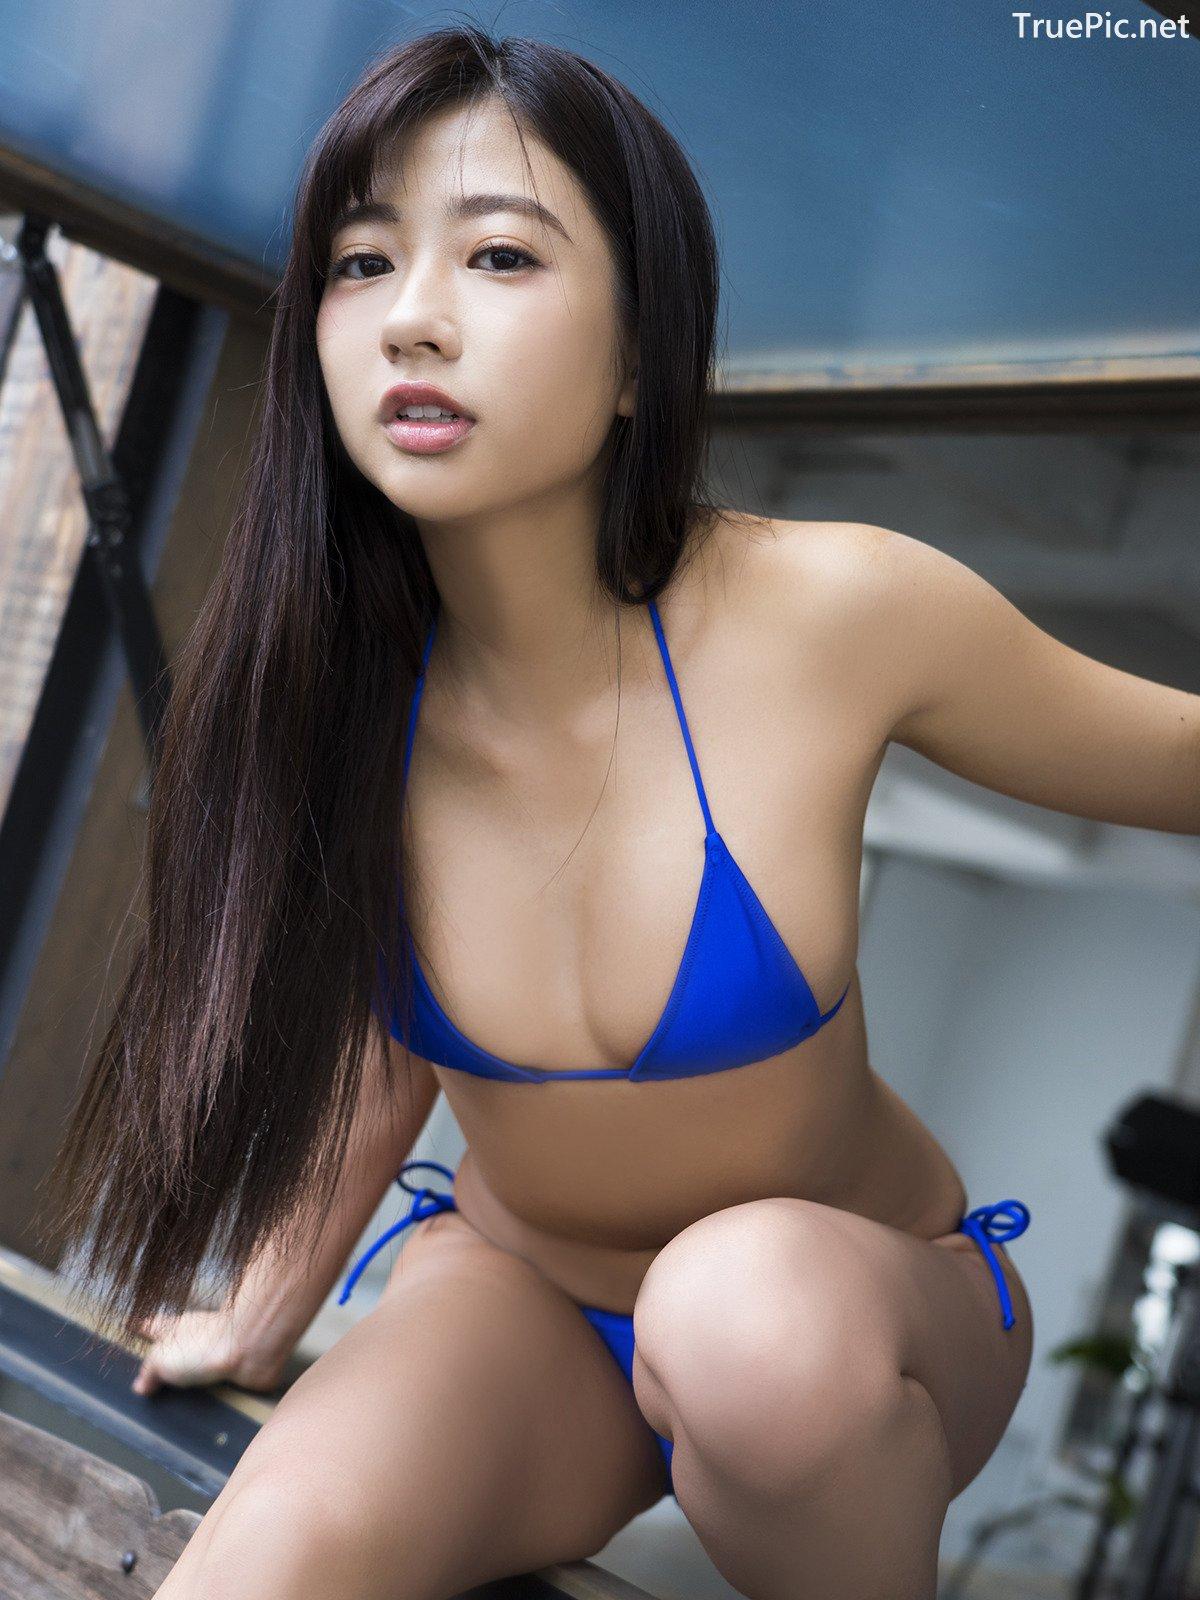 Image Japanese Gravure Model - Sayaka Ohnuki - Maiden Love Story - TruePic.net - Picture-34